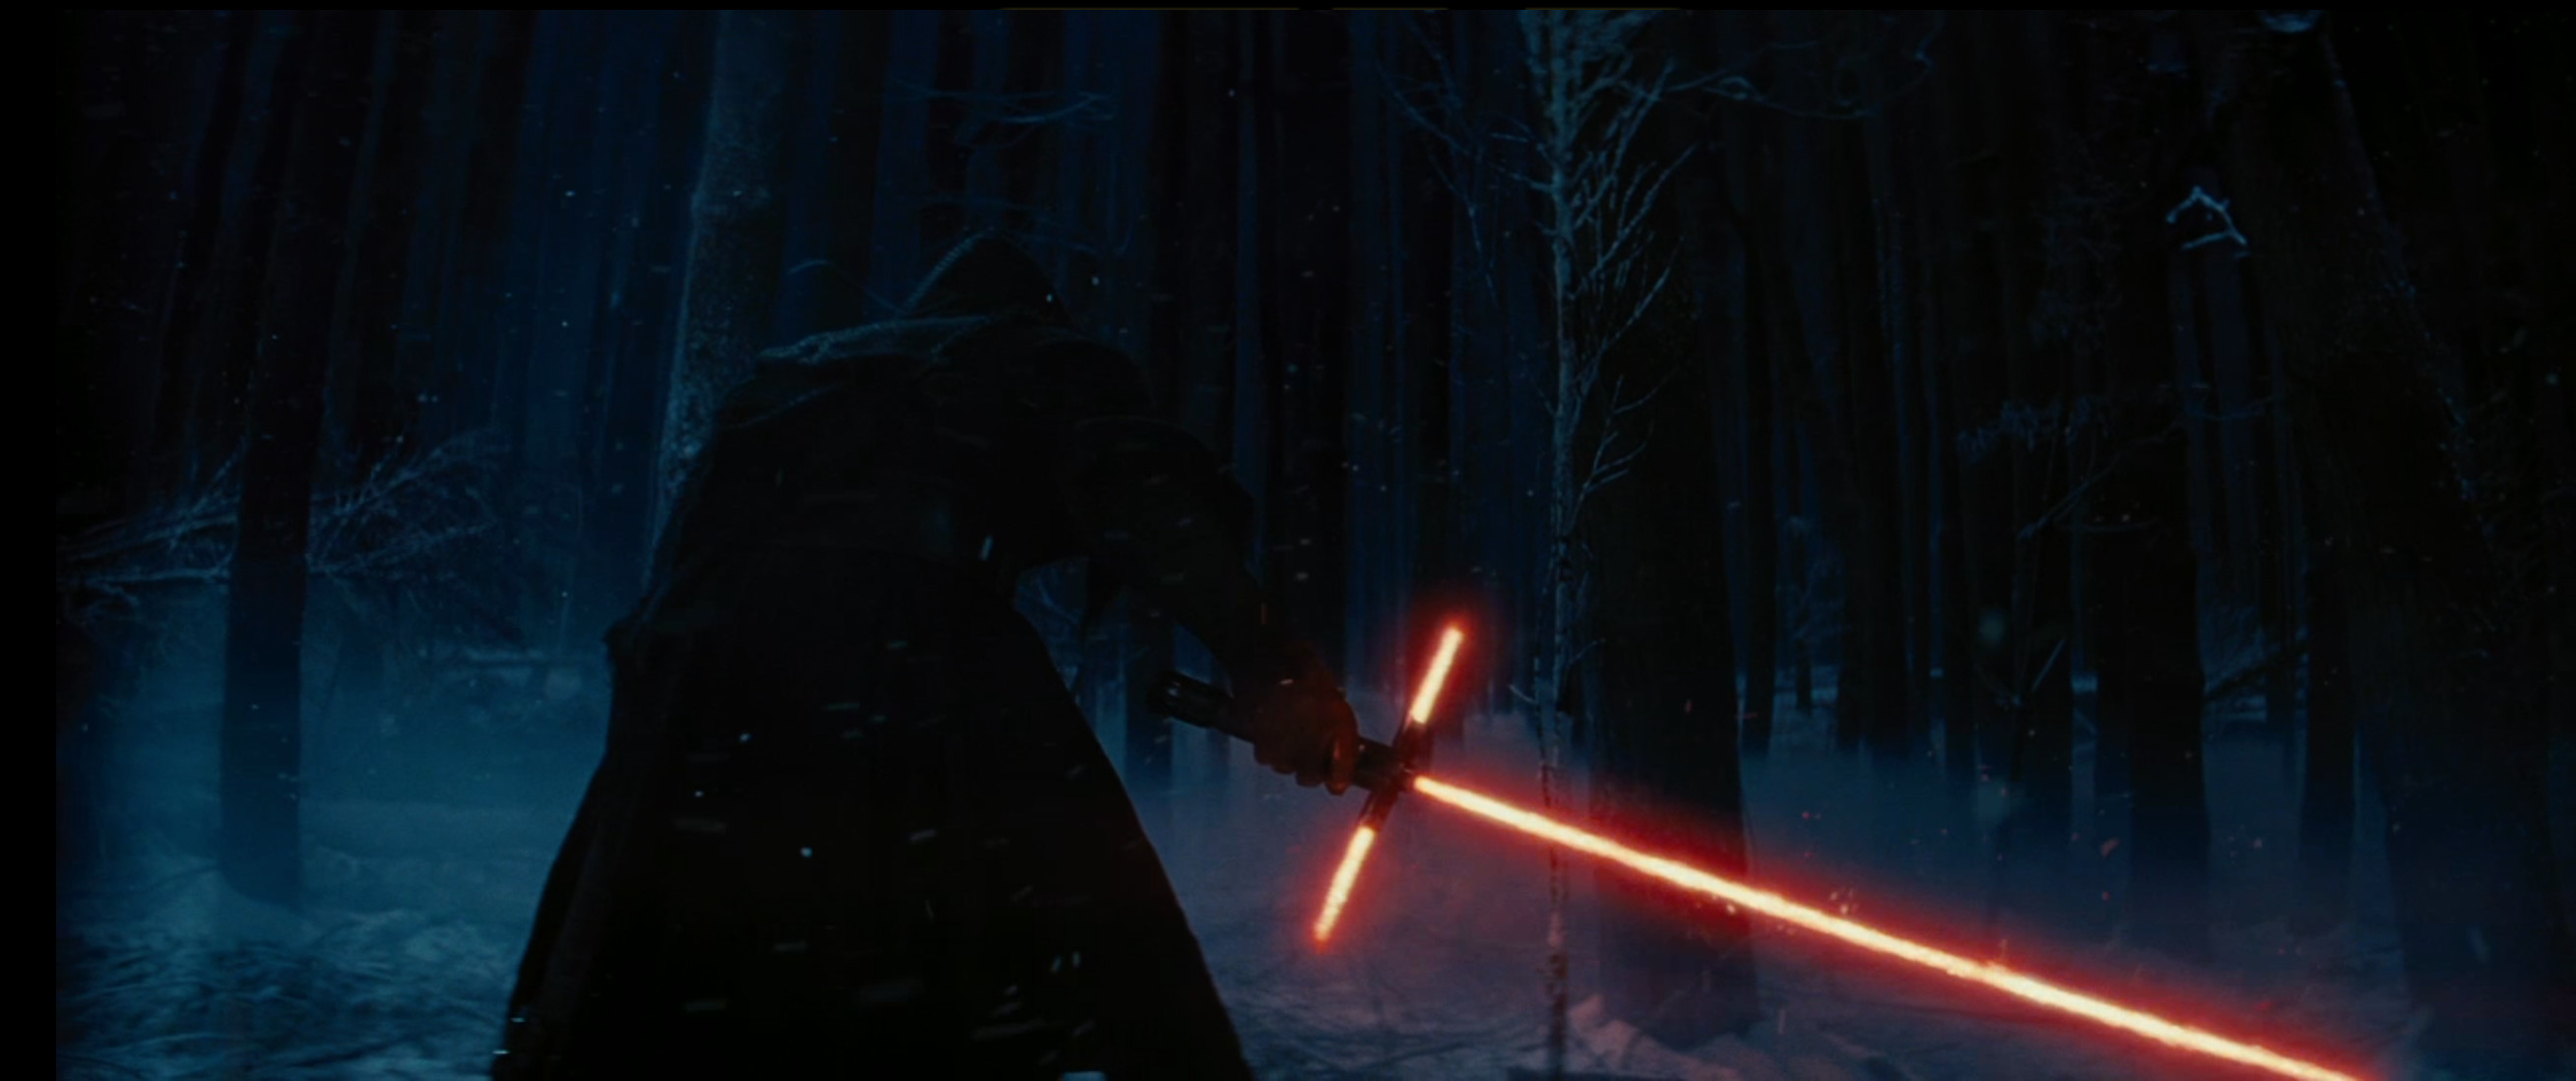 star-wars-the-force-awakens-image-1-lightsaber